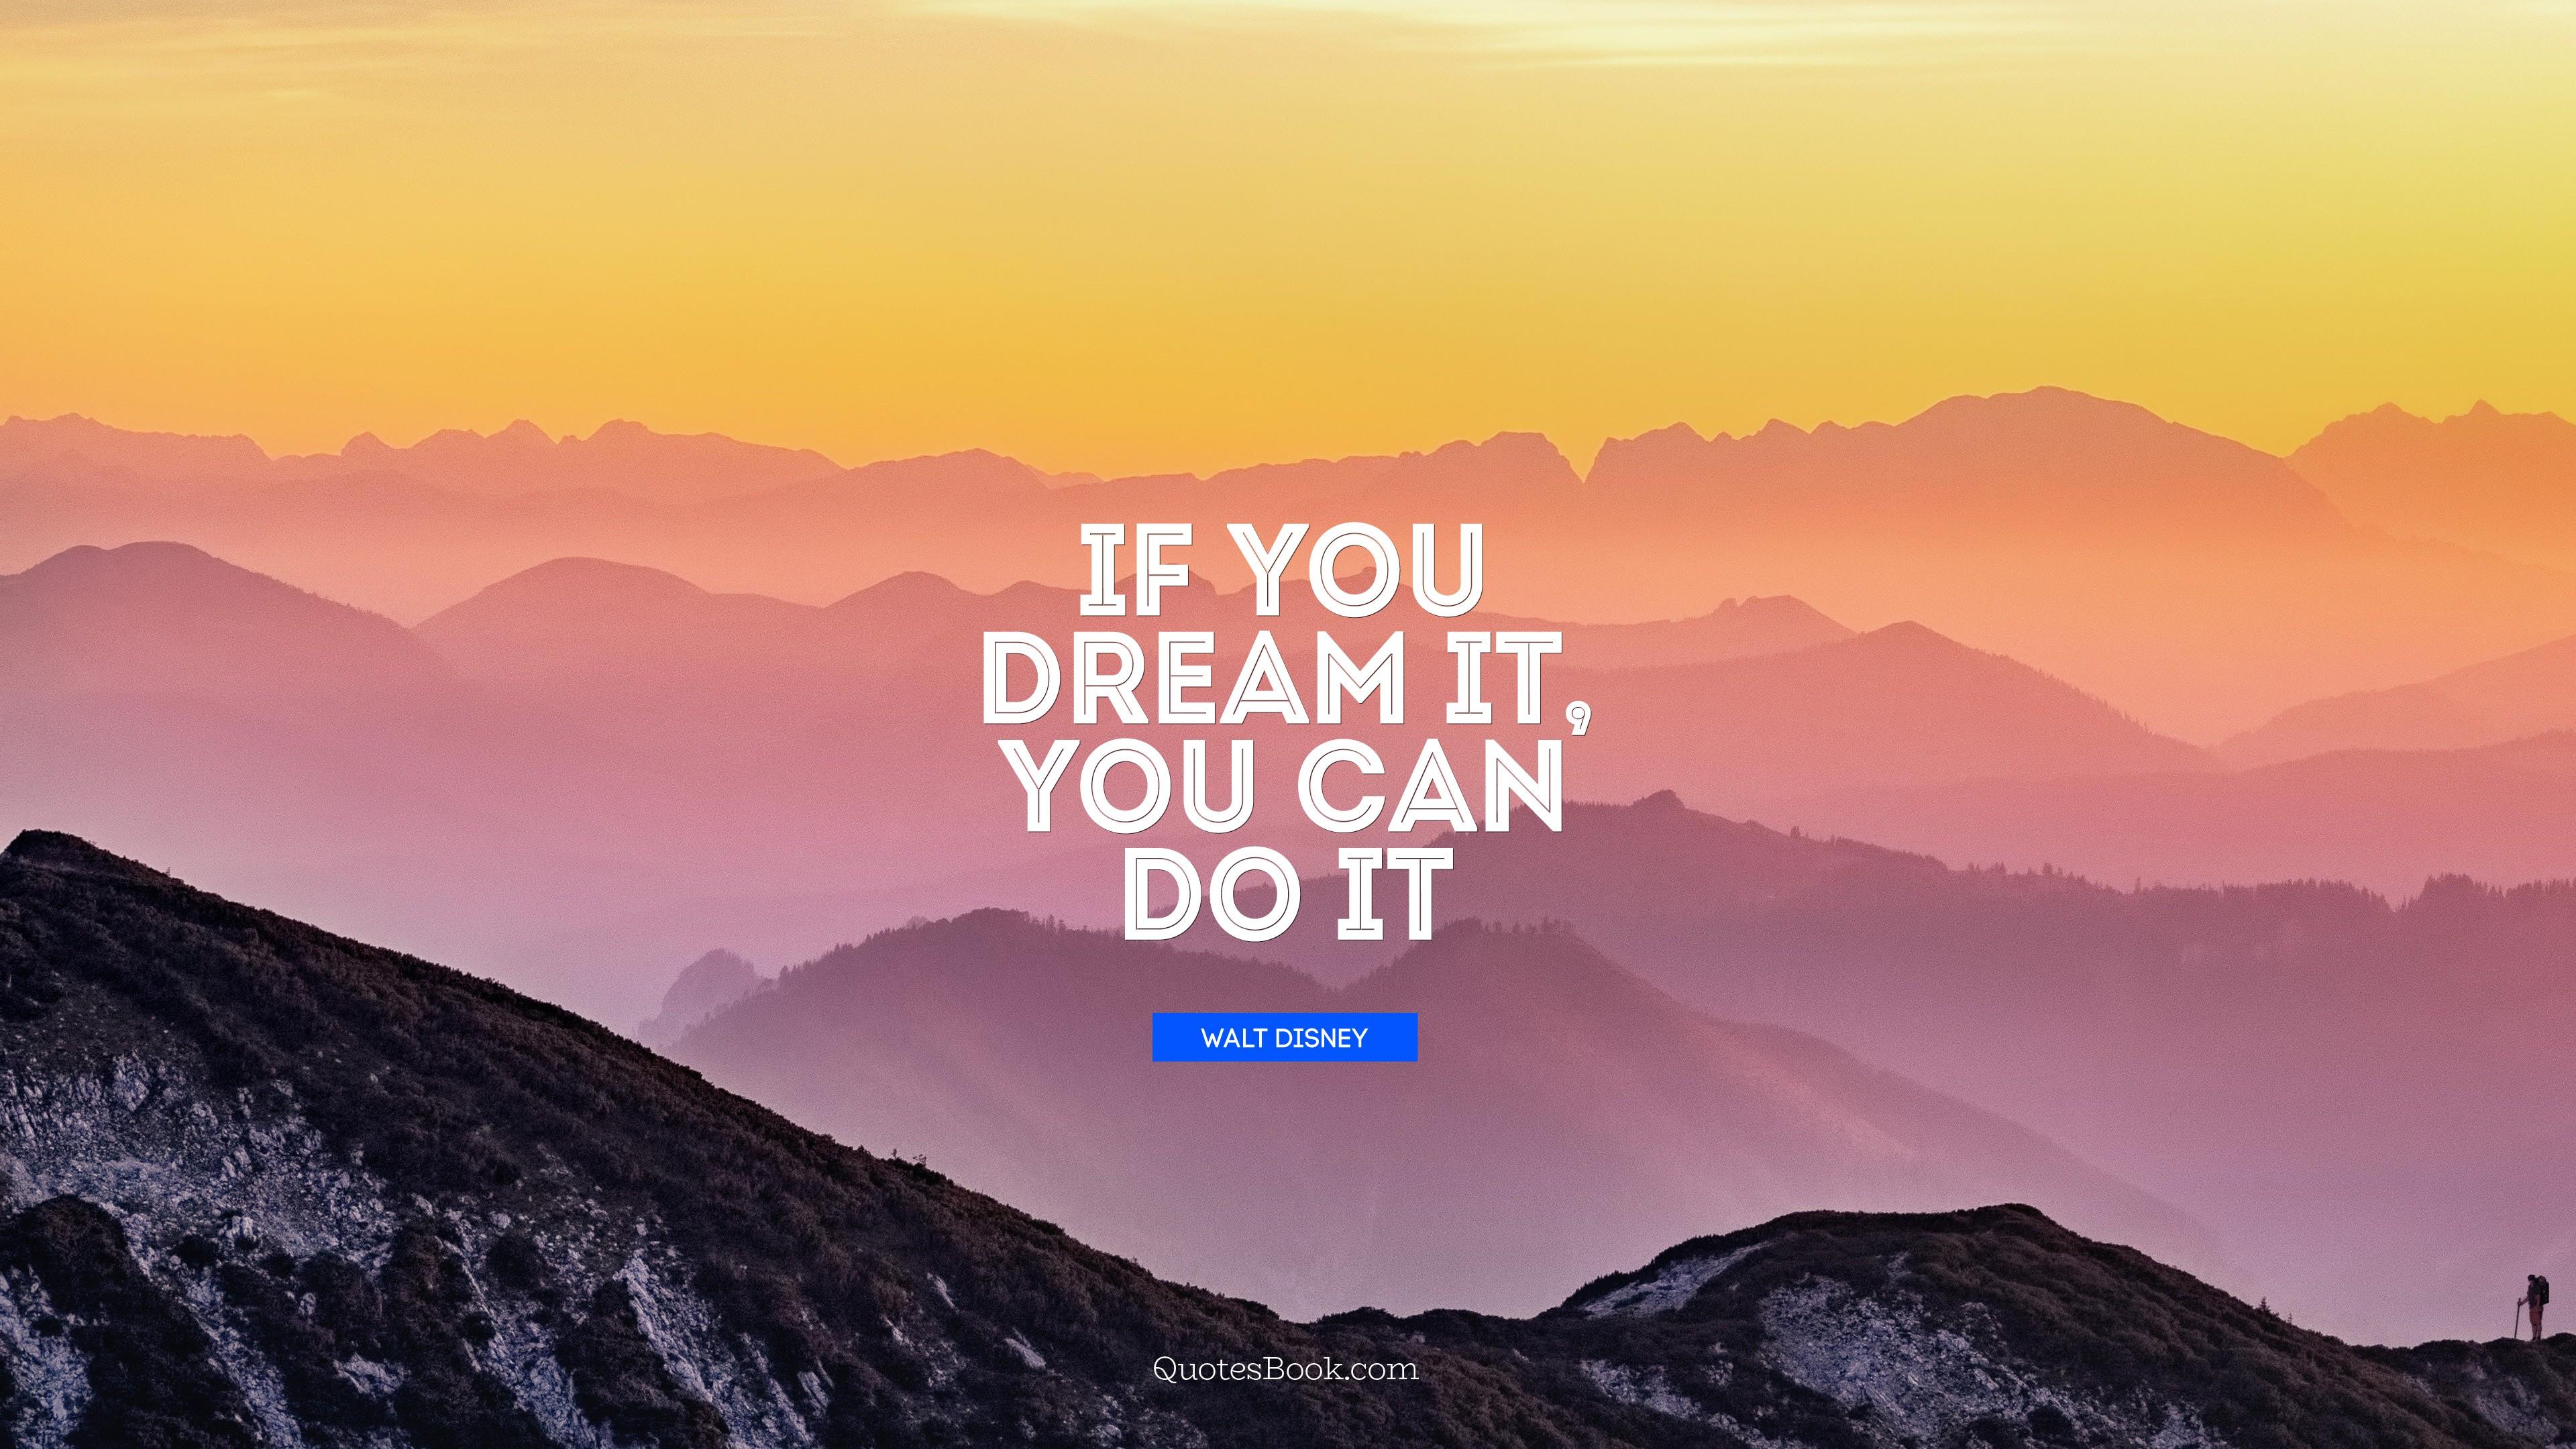 WALT DISNEY QuotesBook.com https://inspirational.ly